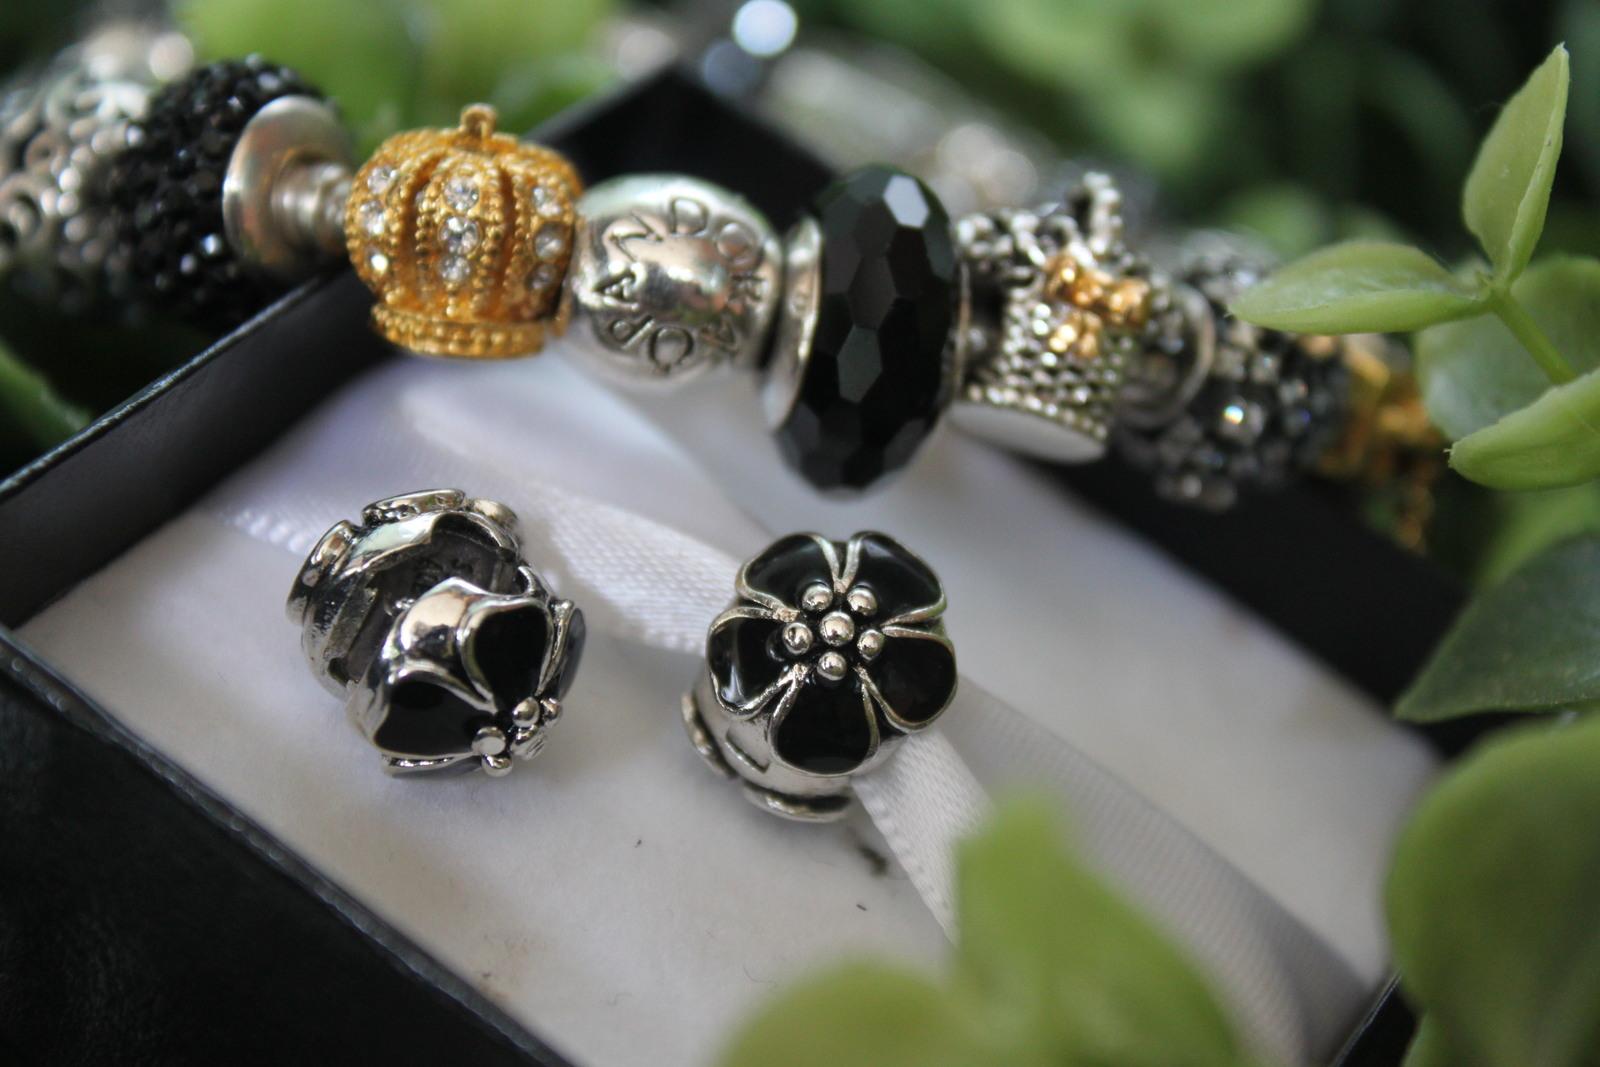 Sterling Silver 925 Flower Clip Charm Bead Fits Pandora Bracelets 1pcs